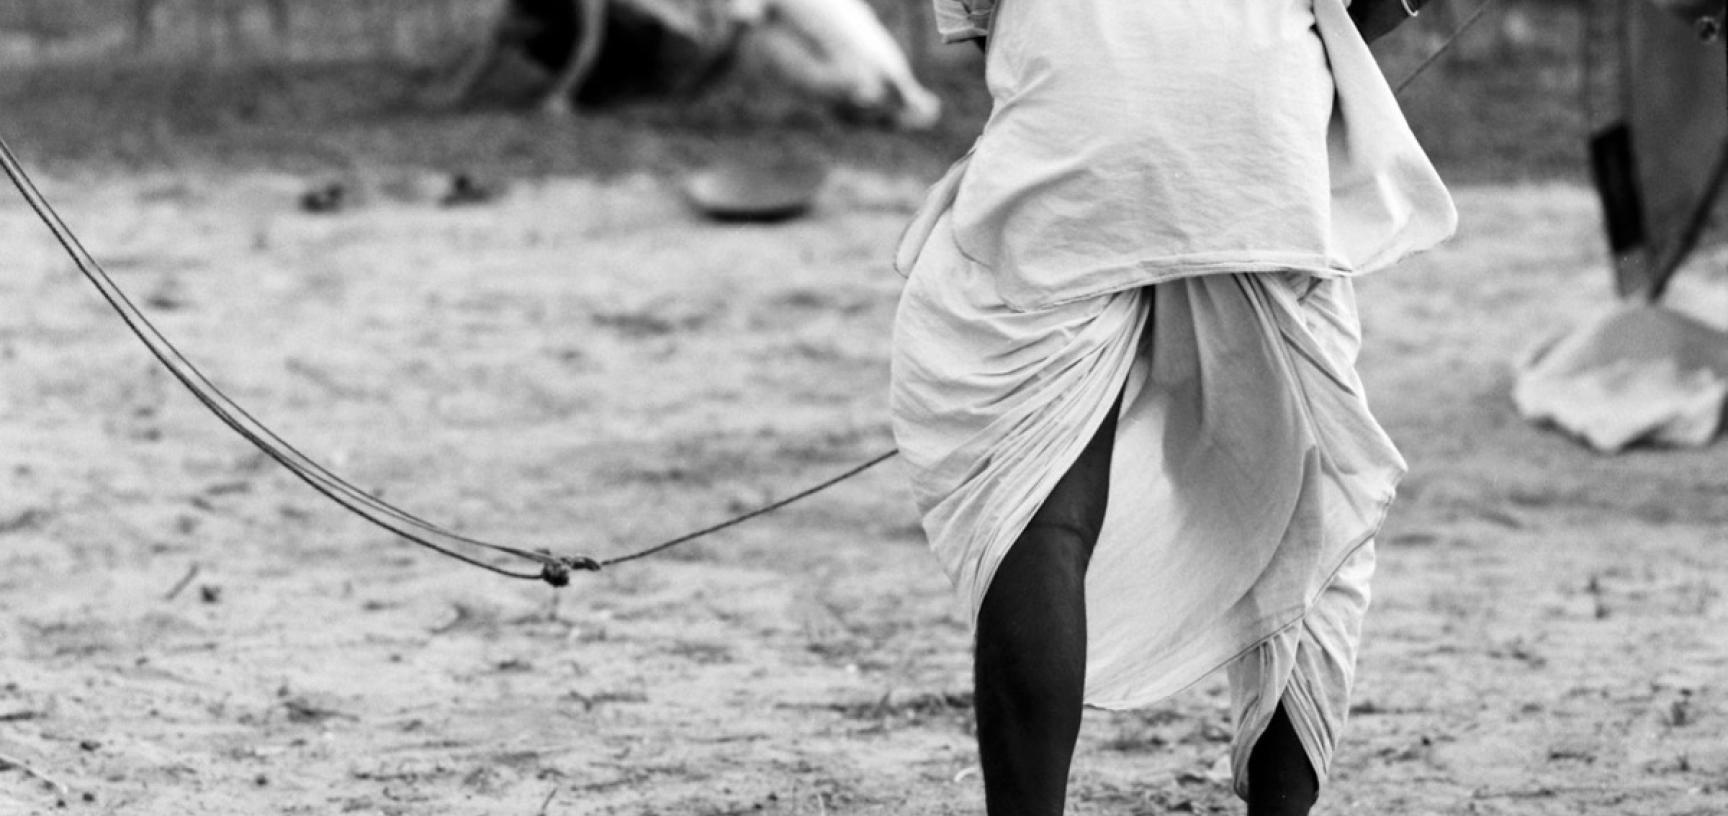 Dhoti garment